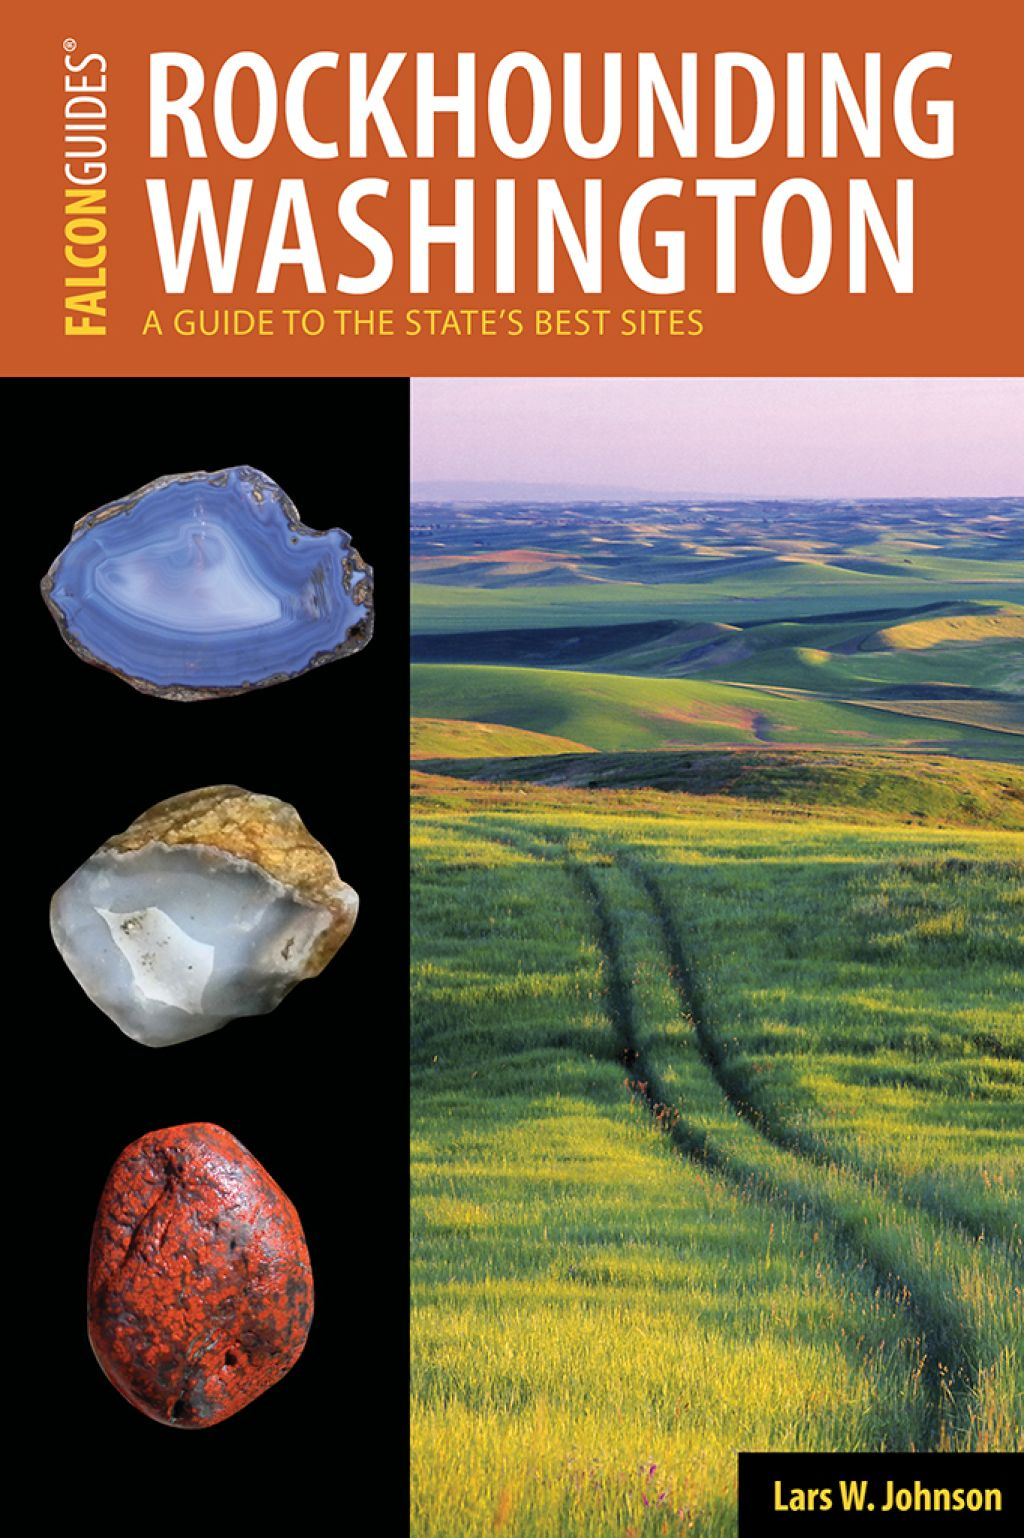 Rockhounding Washington (eBook Rental) in 2020